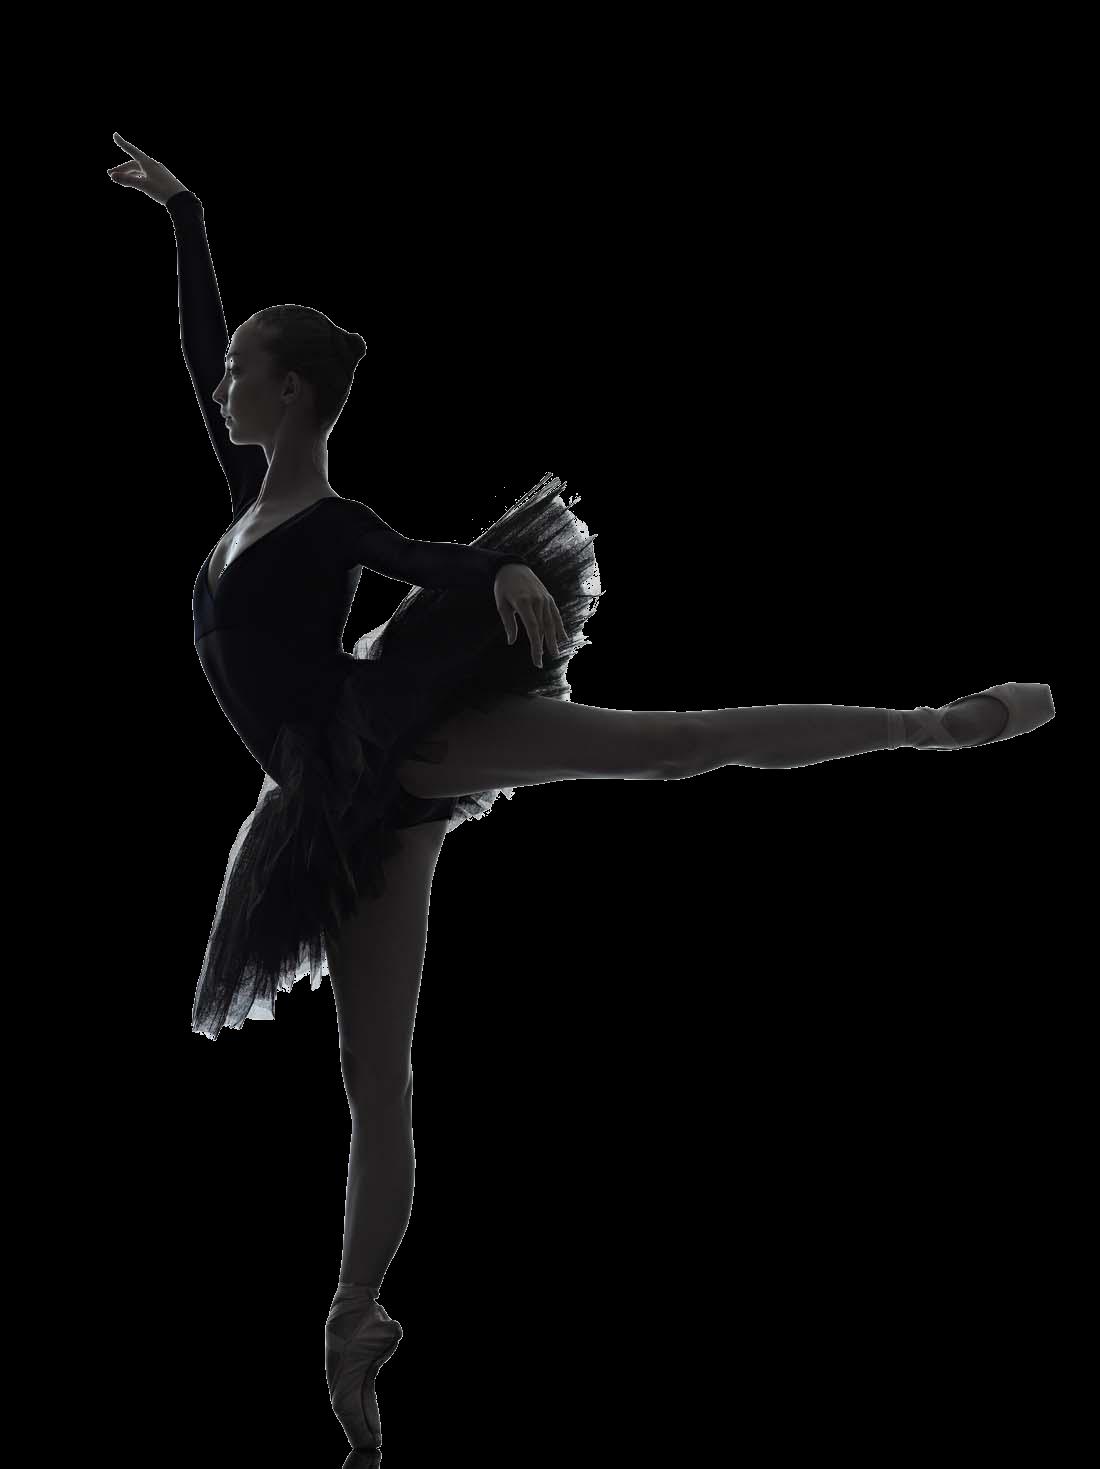 1100x1469 Ballet Dancer Silhouette